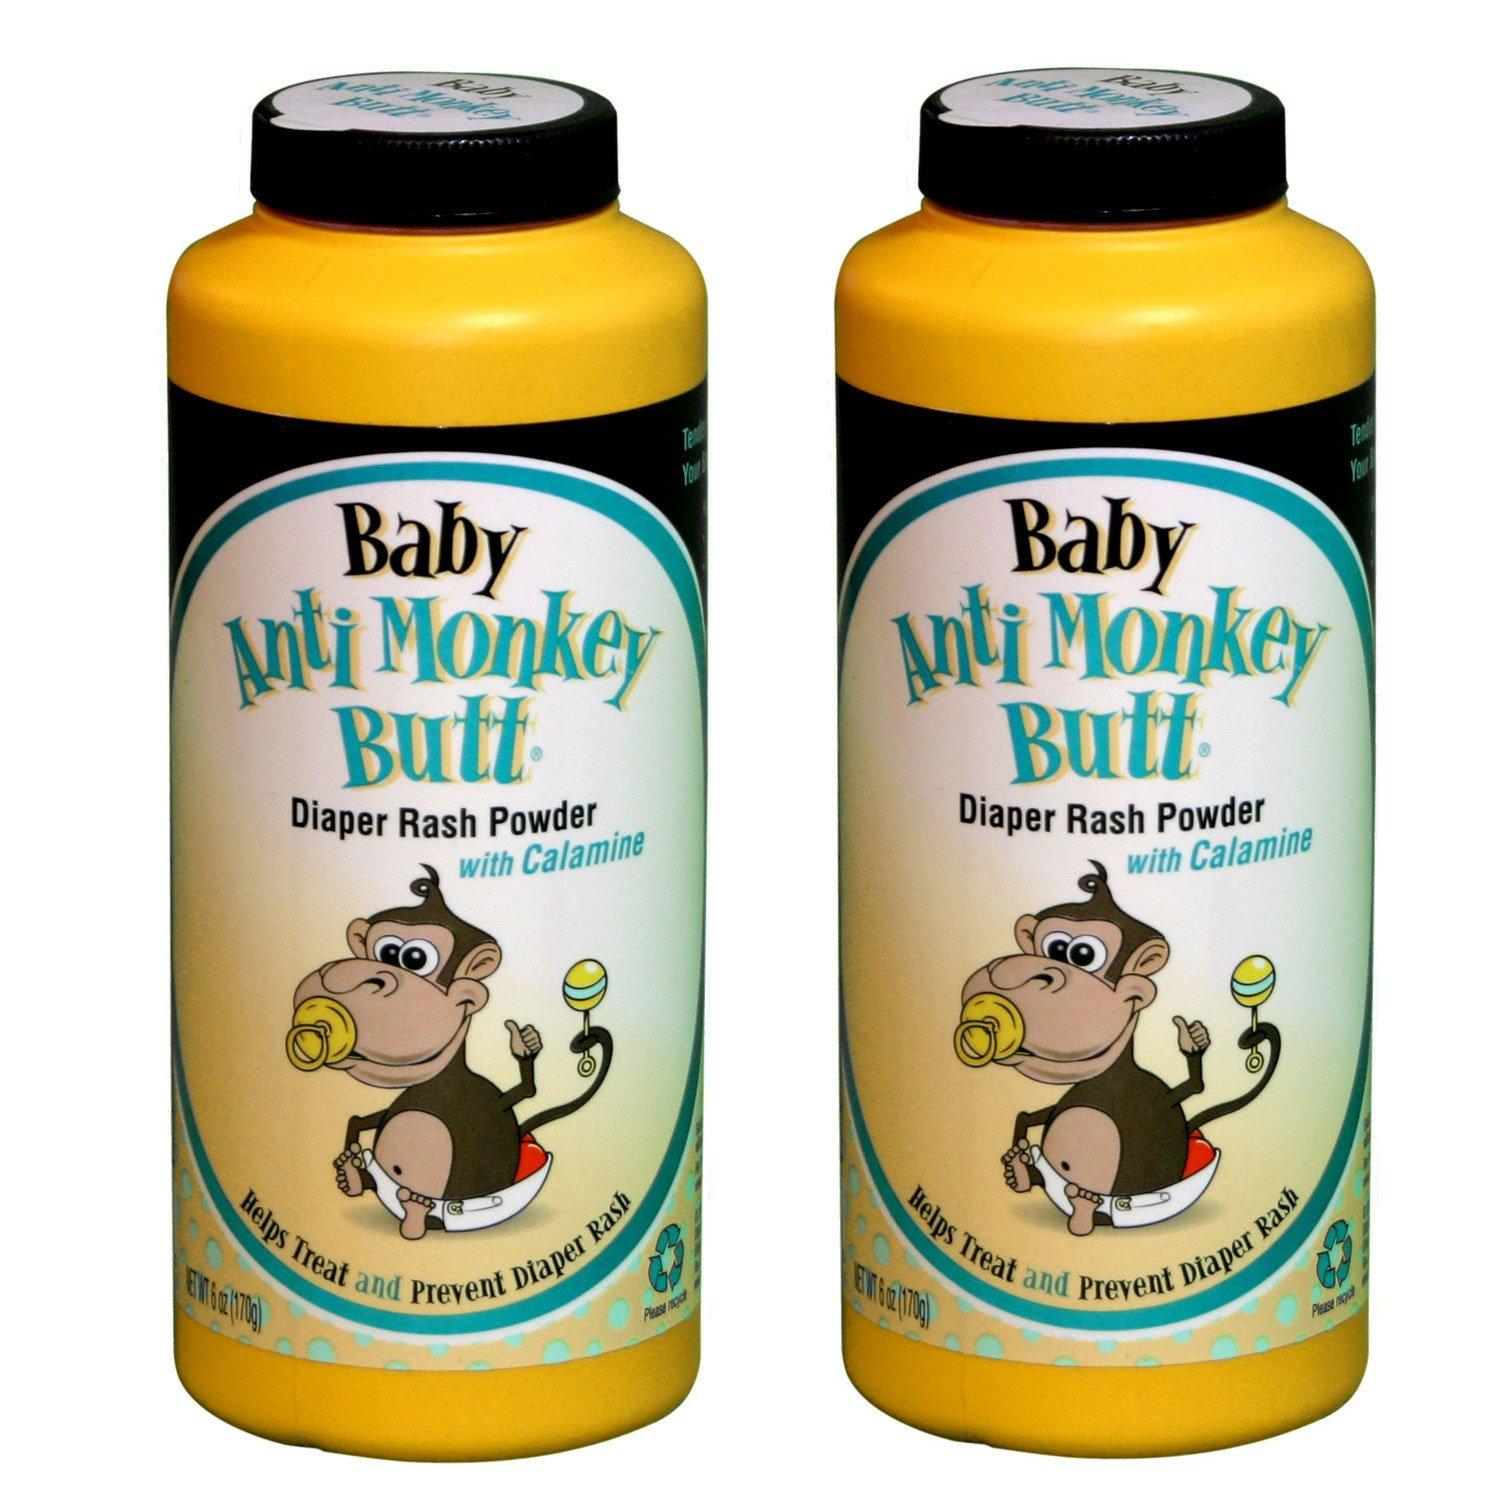 Baby Anti-Monkey Butt Diaper Rash Powder, 6oz. Bottle - 2 Pack by Baby Anti-Monkey Butt